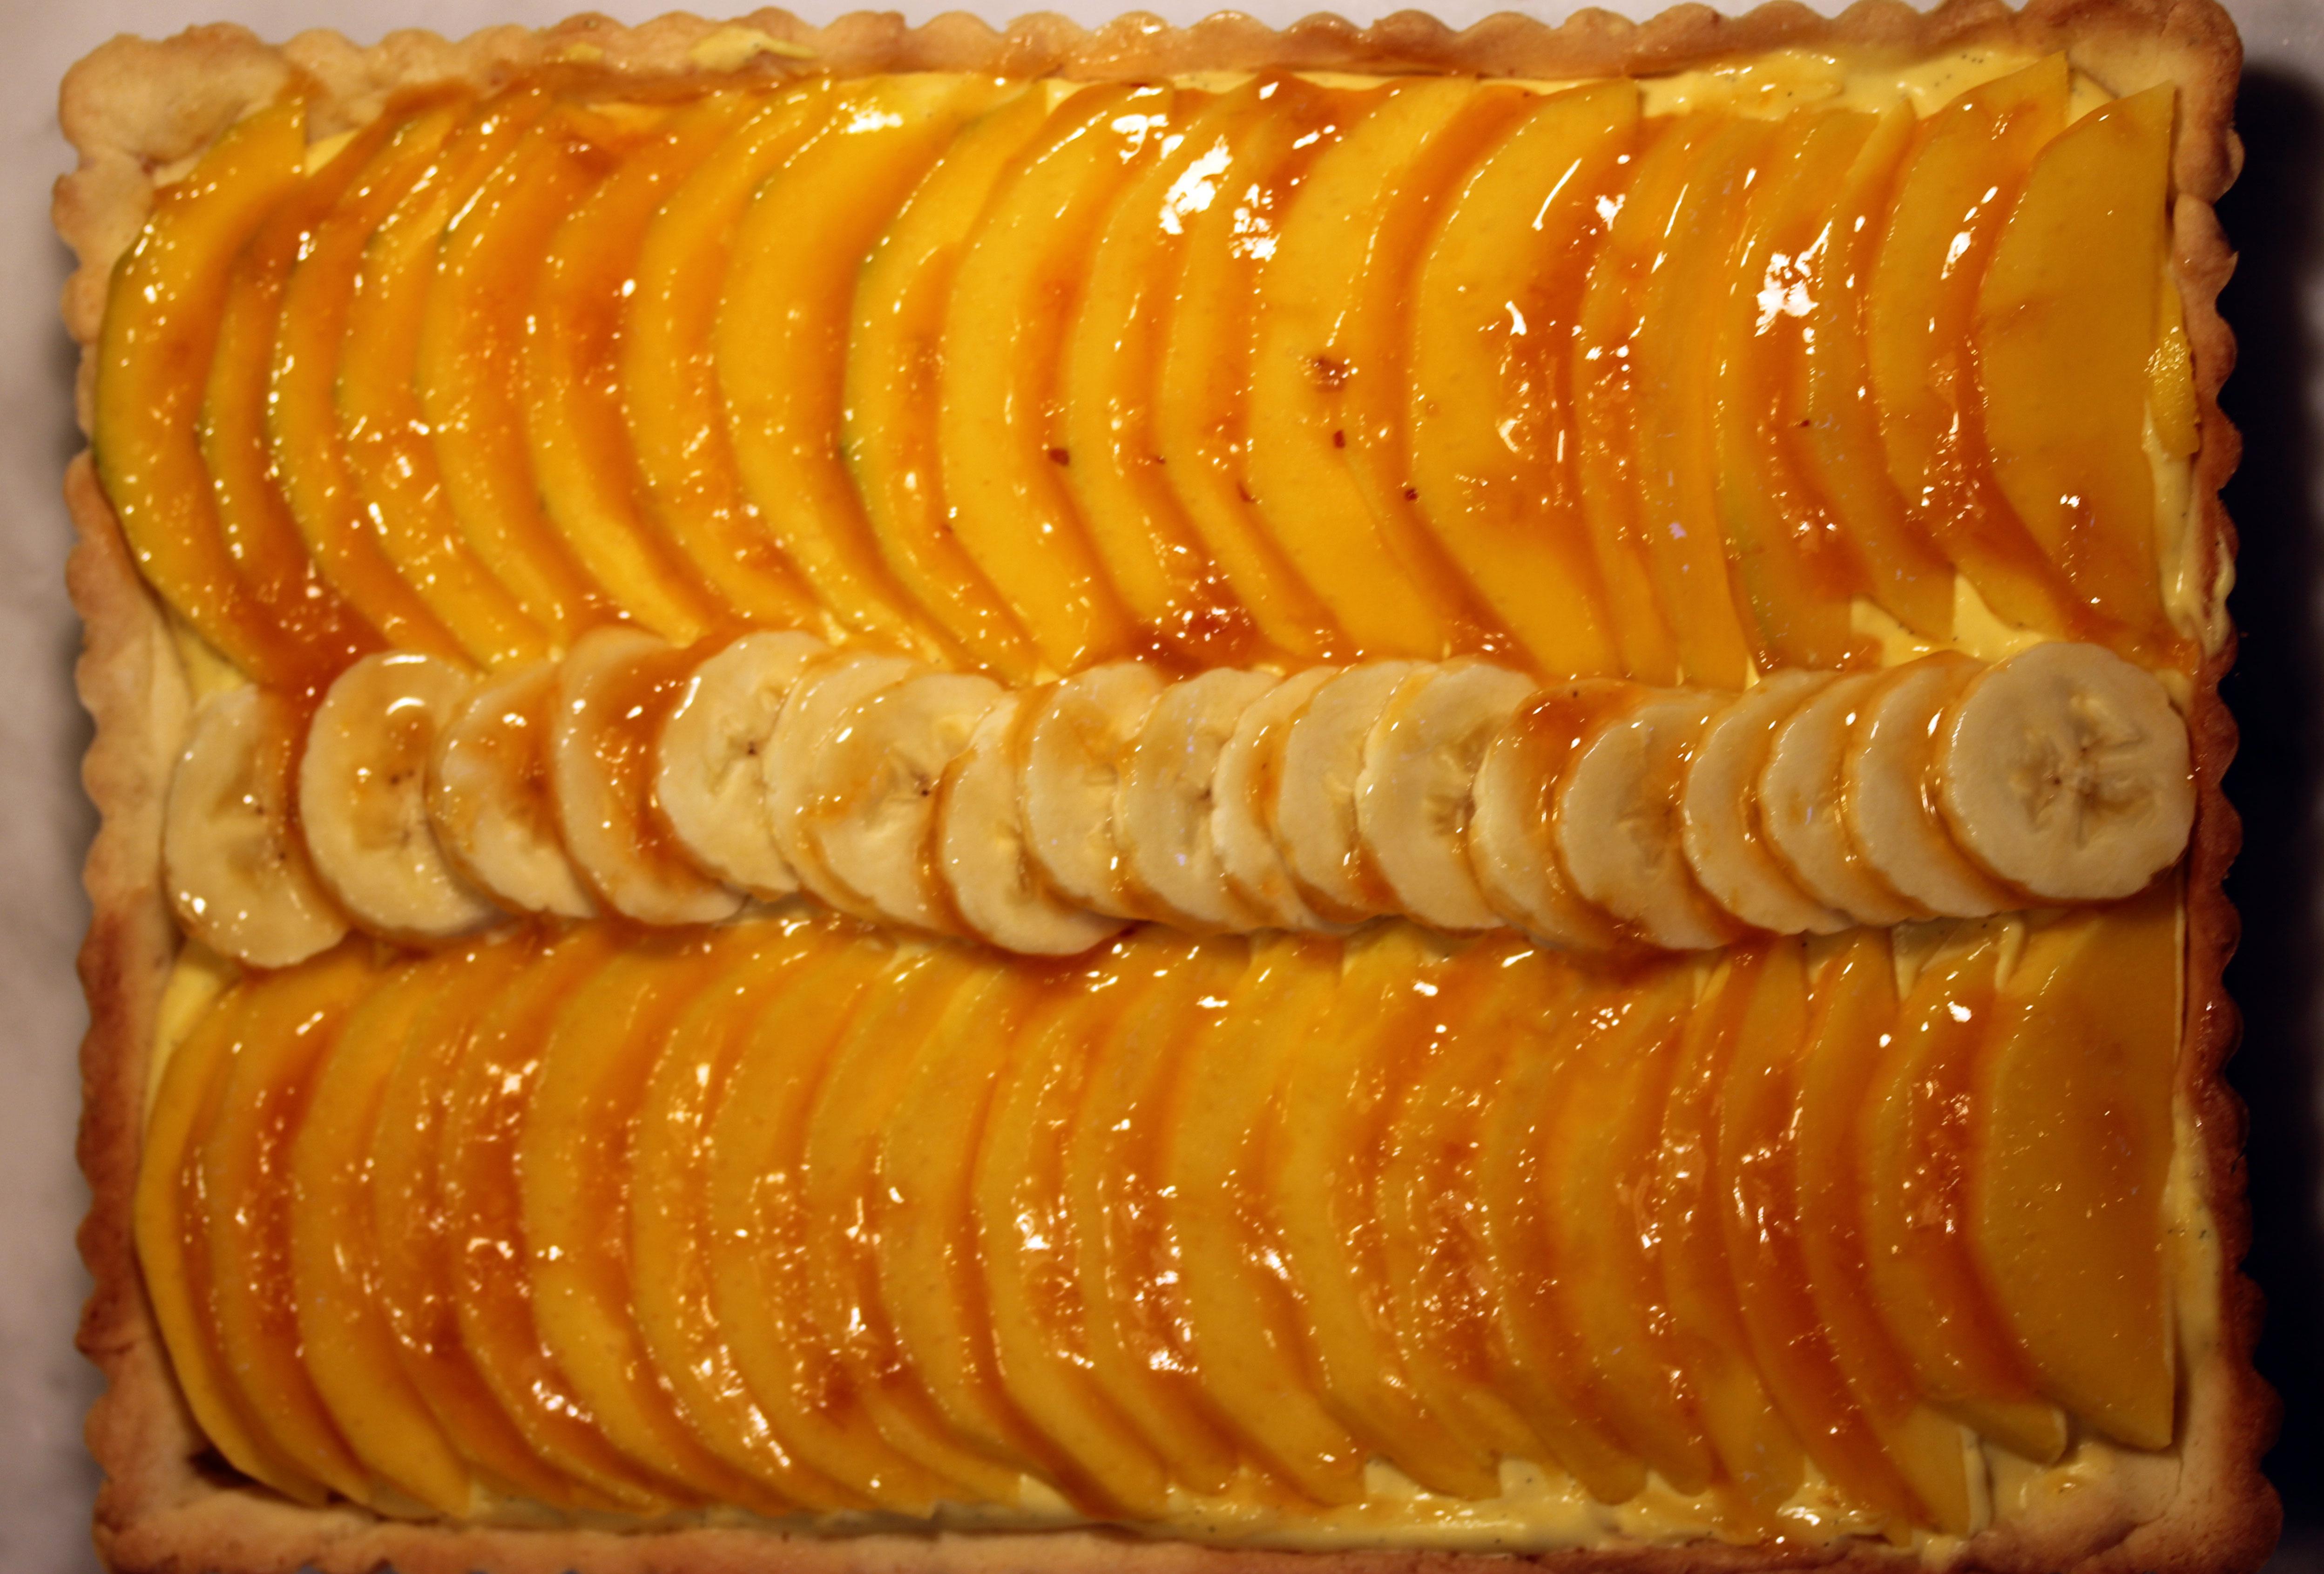 TBT Recipe: On Pastry Cream